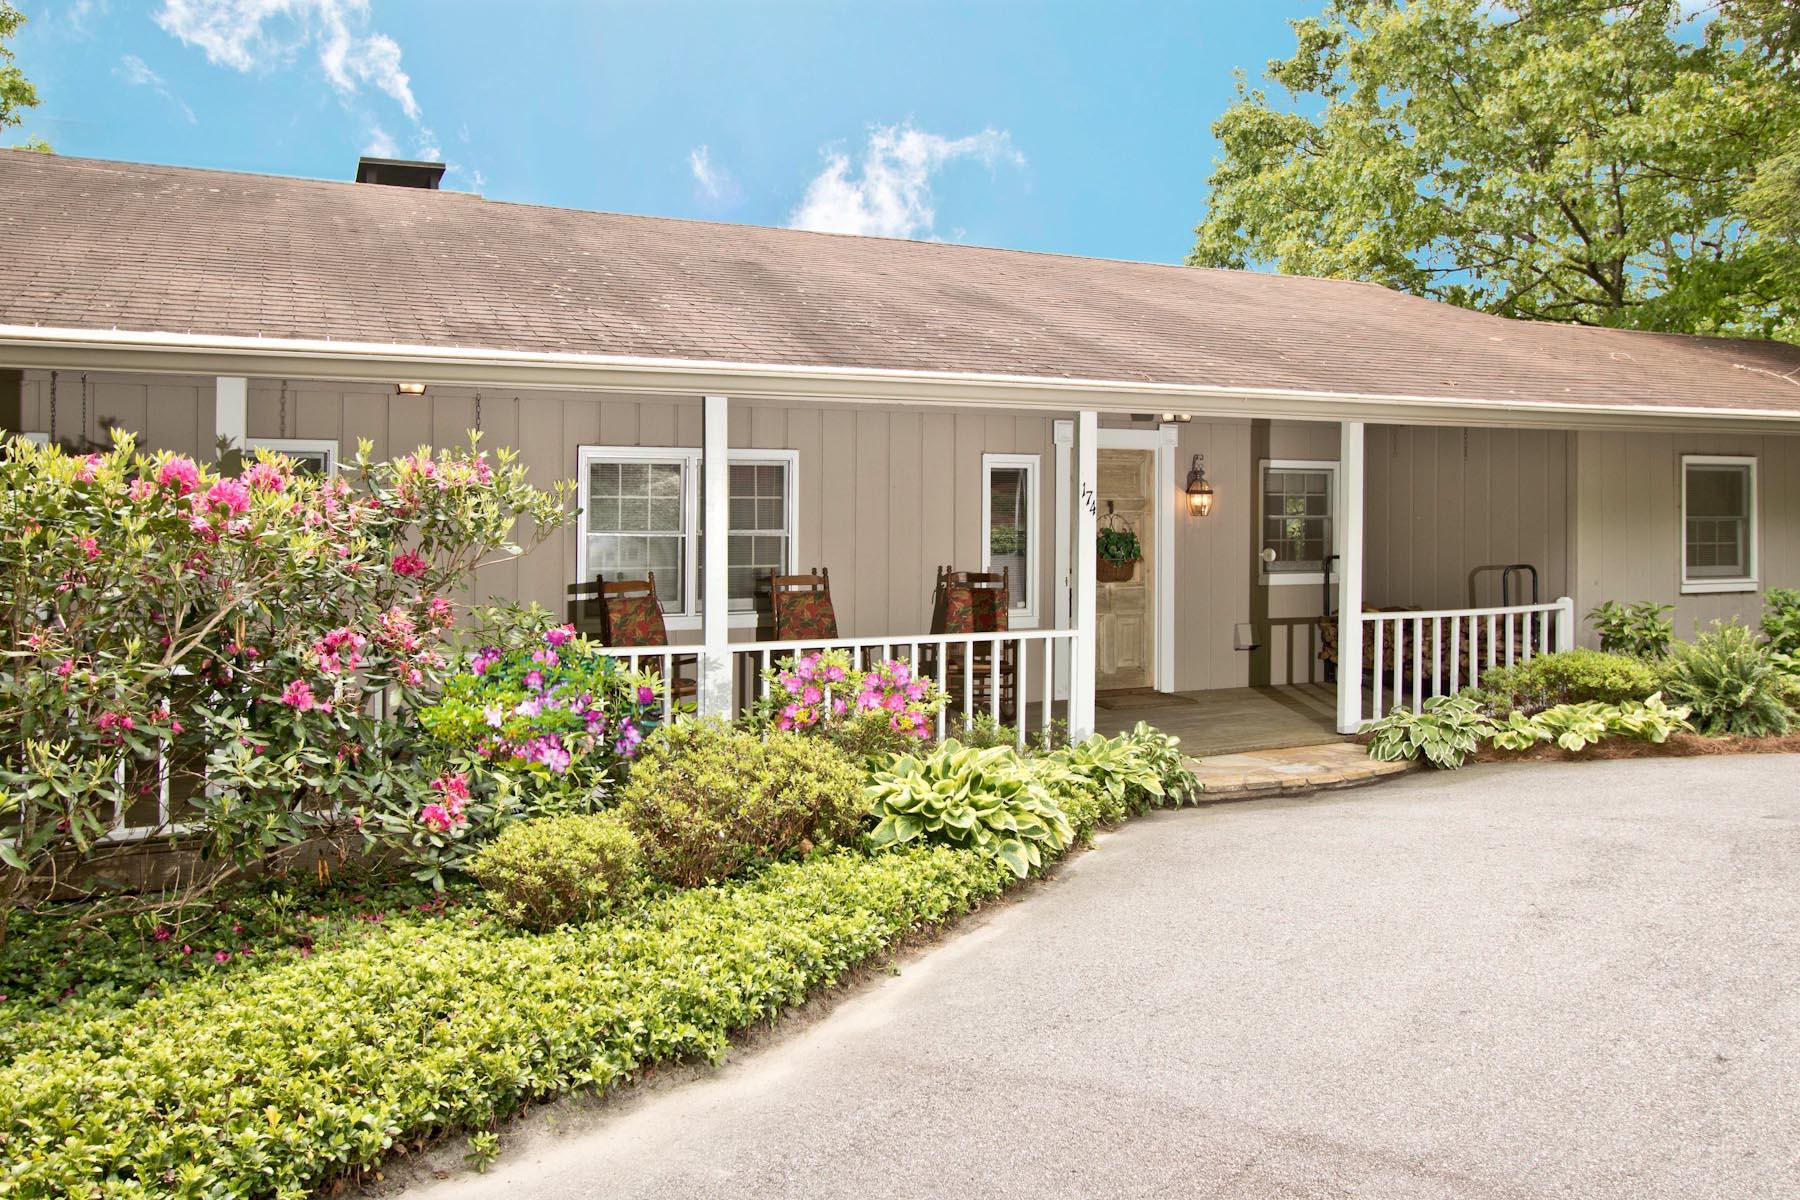 Single Family Home for Sale at 174 Zermatt Circle Highlands, North Carolina, 28741 United States